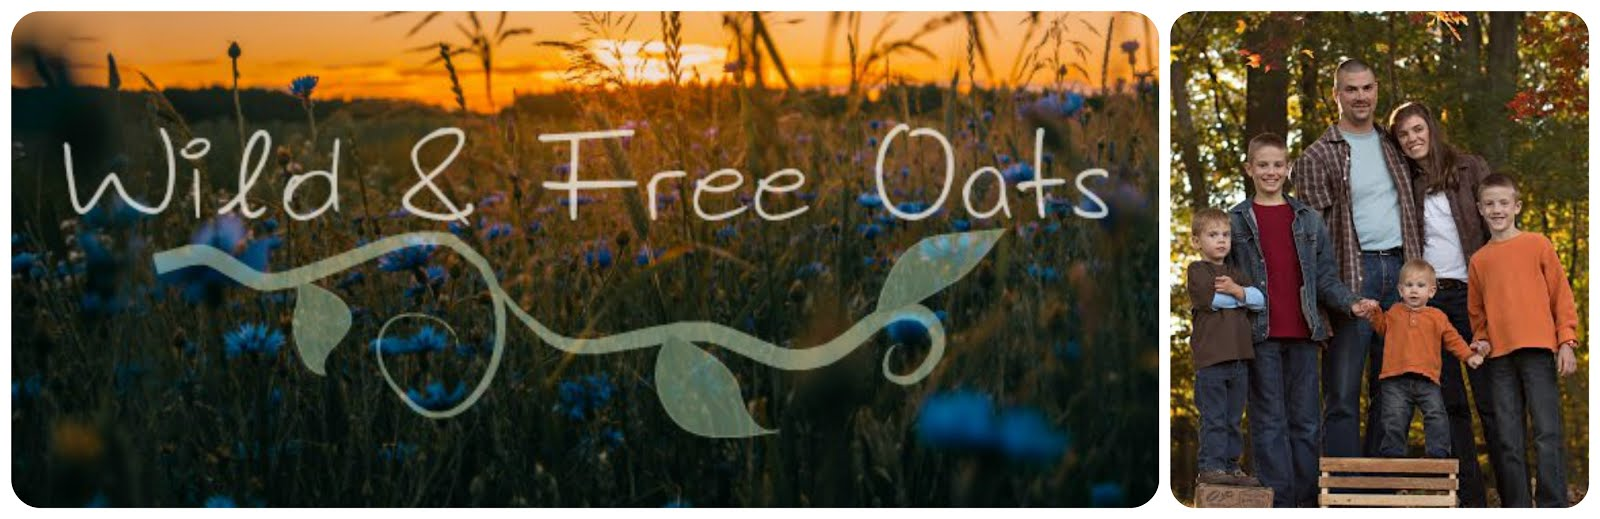 Wild & Free Oats Banner